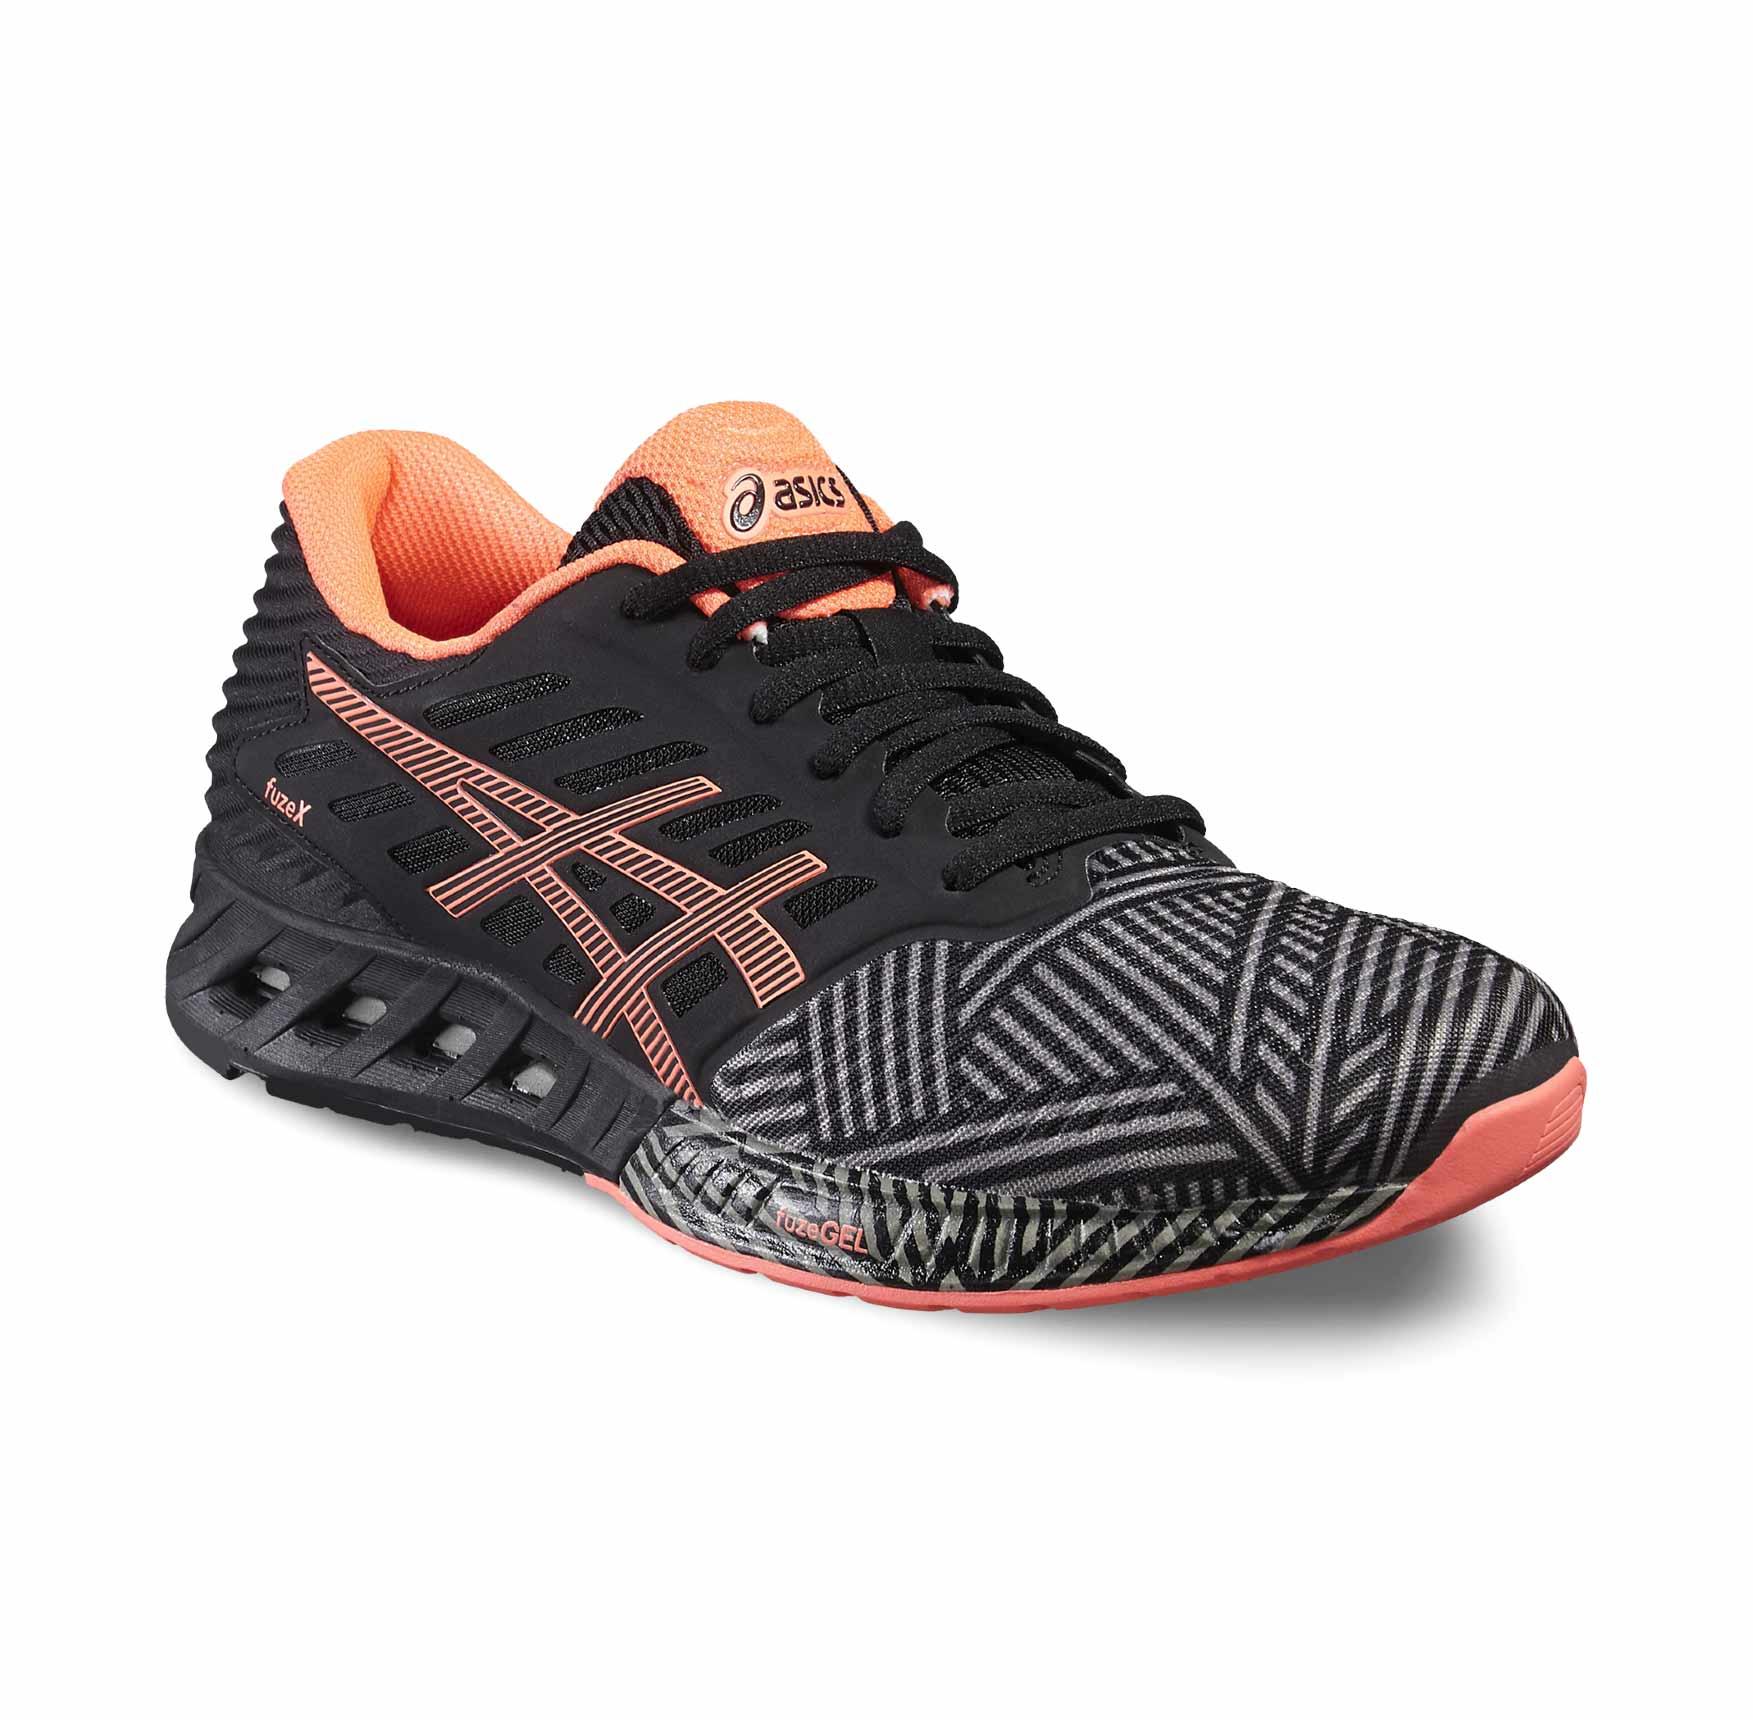 נעלי ריצה לנשים - דגם Asics FuzeX